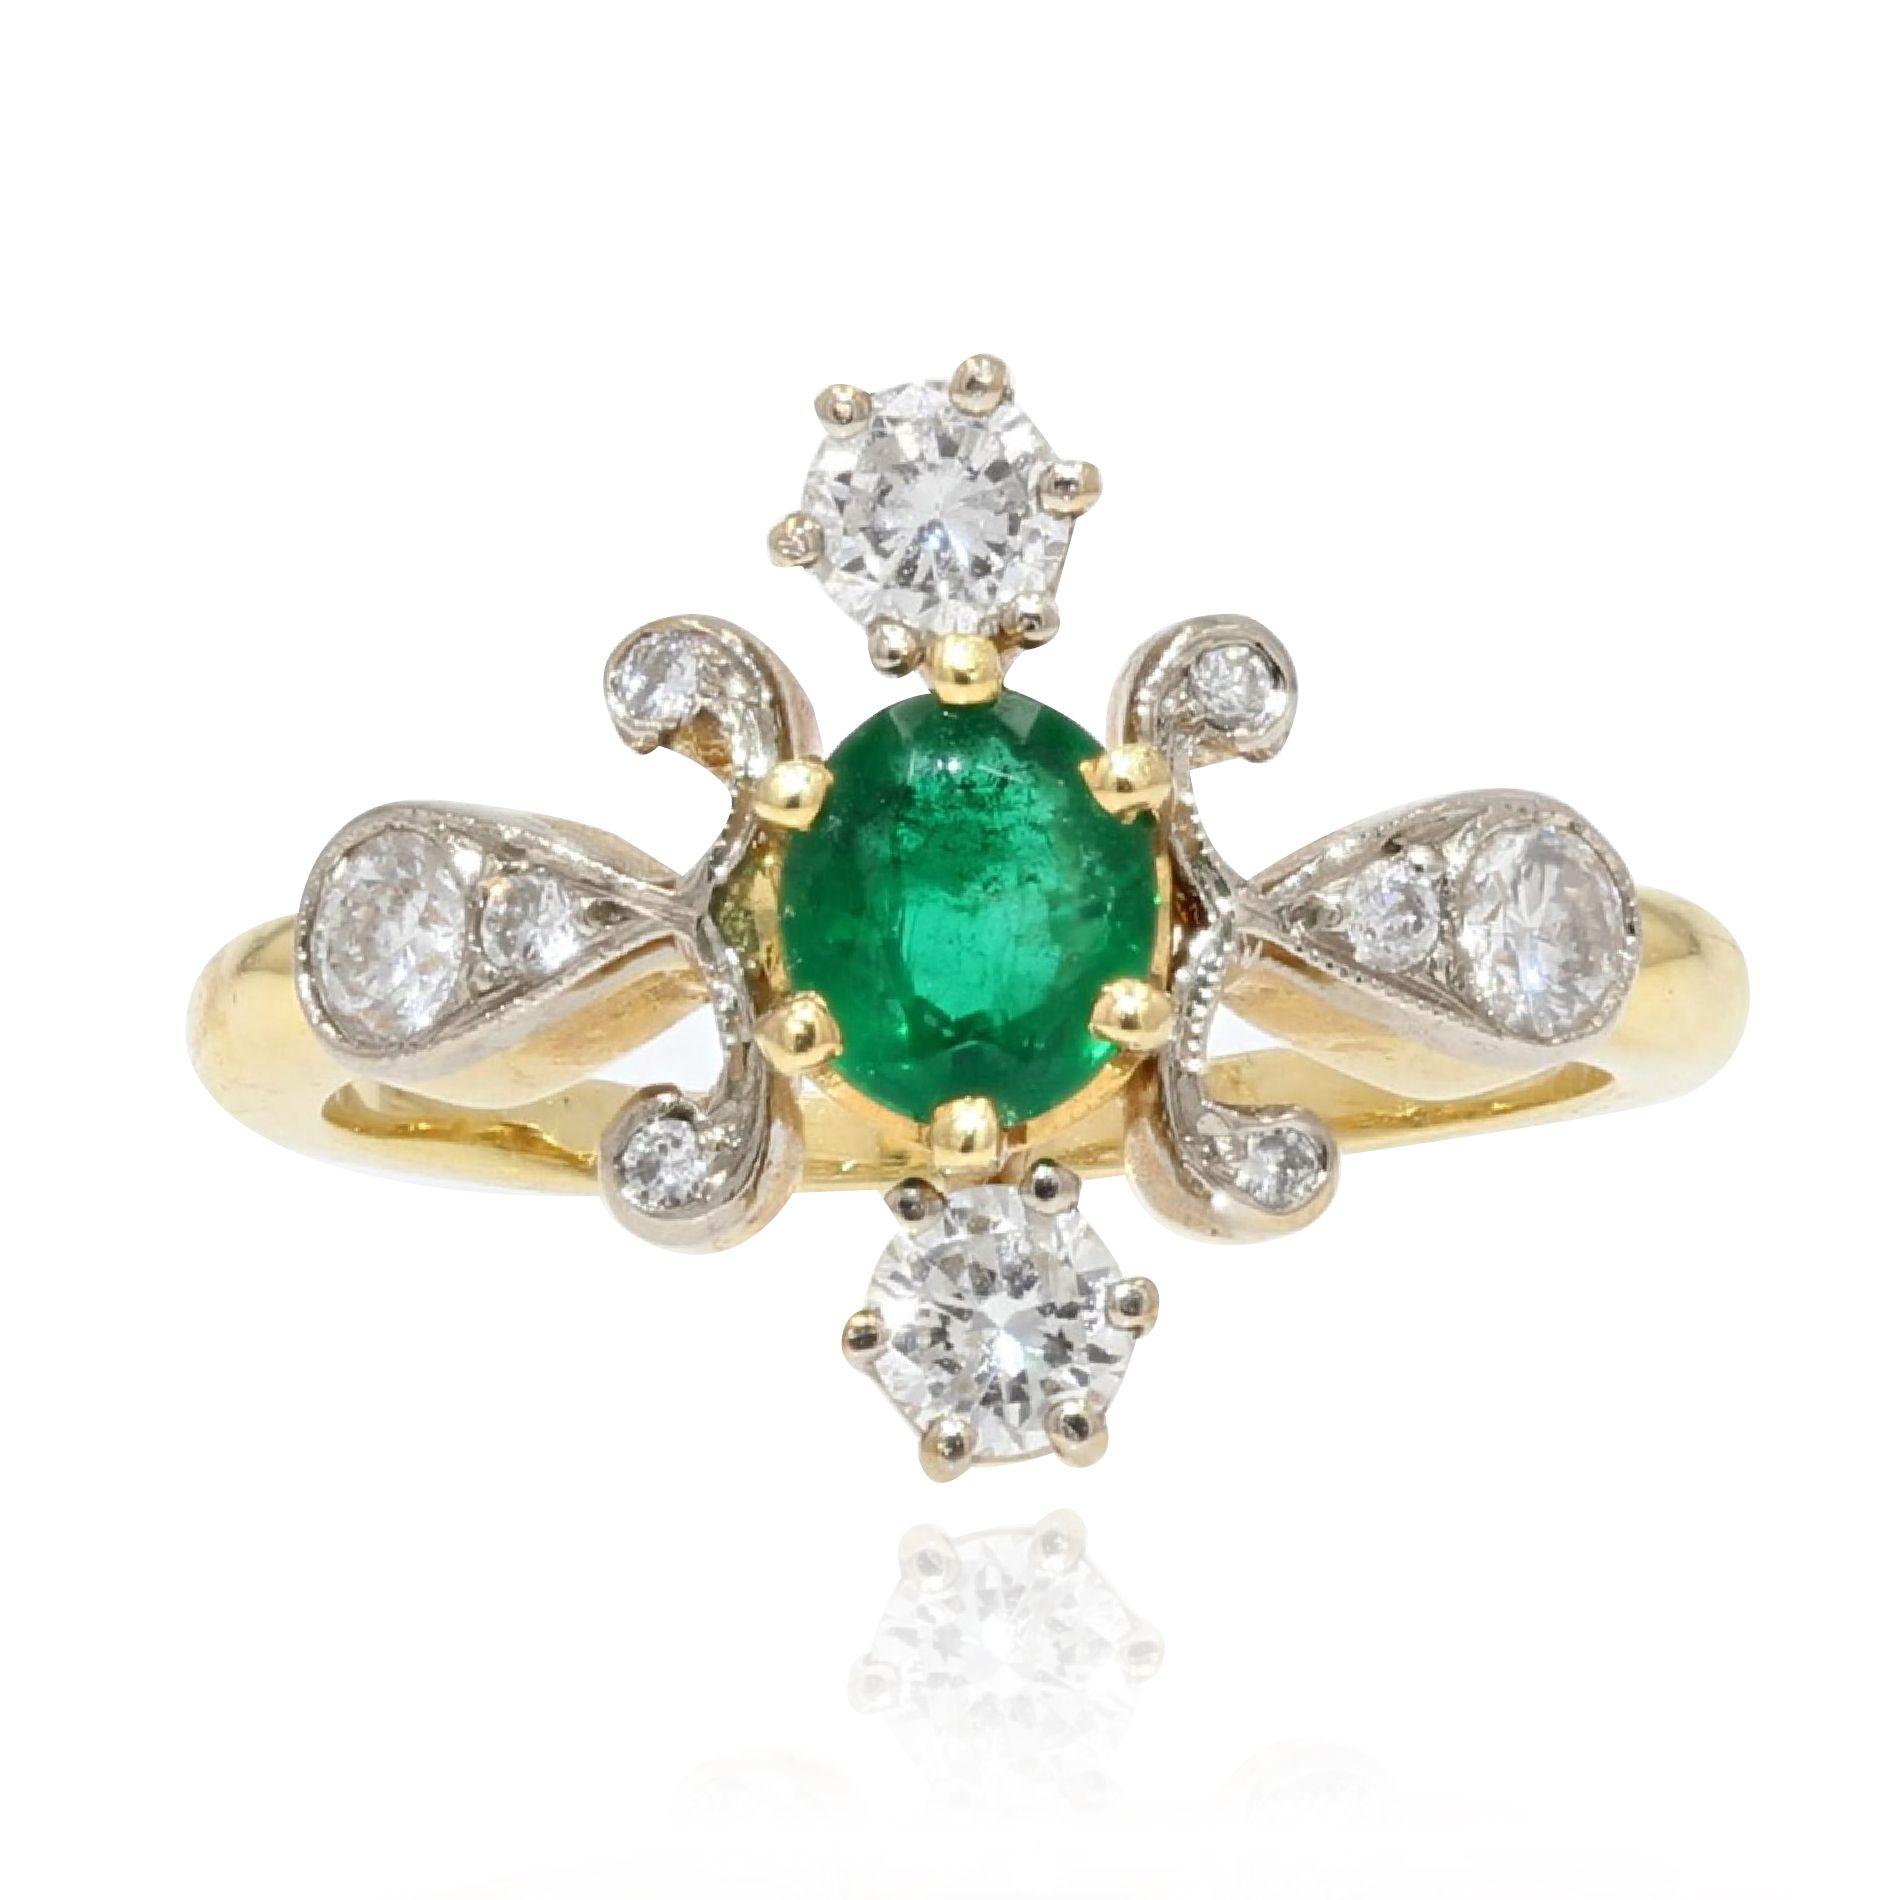 Bague émeraude diamants or jaune platine